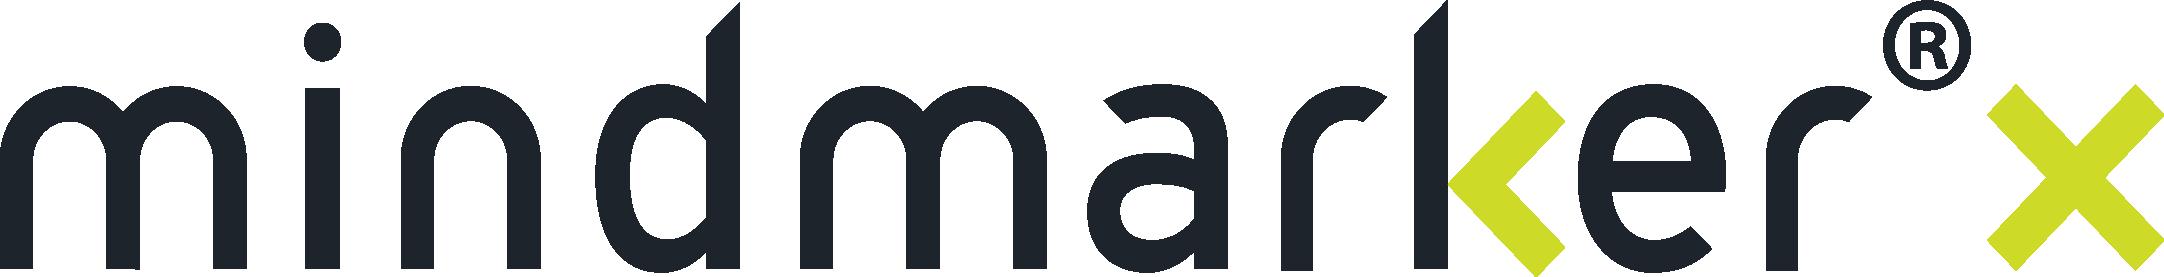 Mindmarker logo linking to mindmarker.com